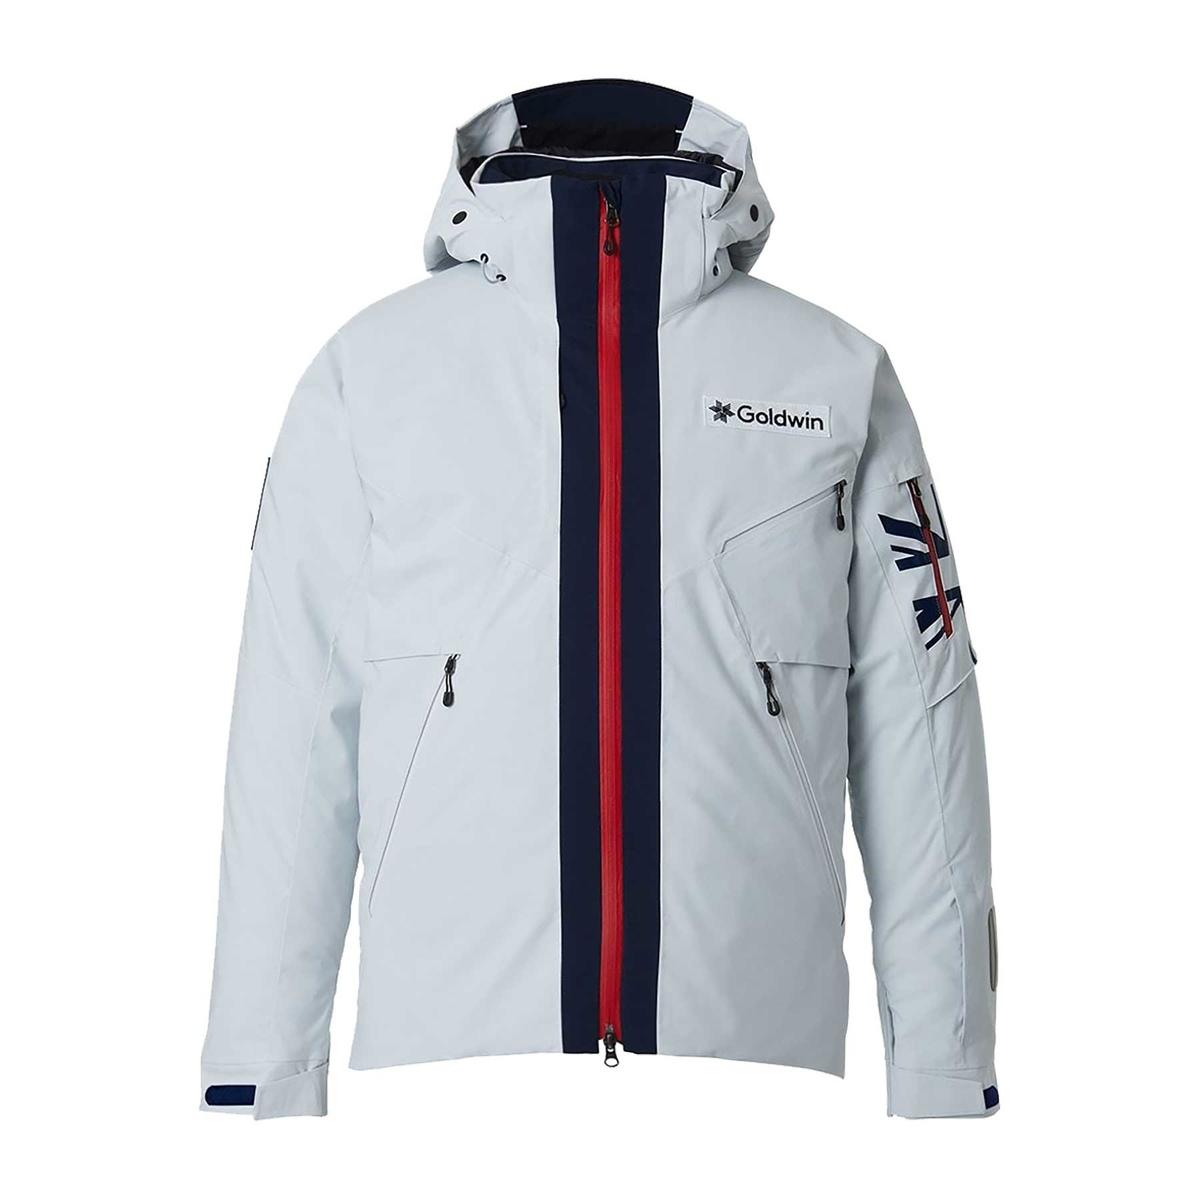 Prezzi Goldwin giacca great britain team replica